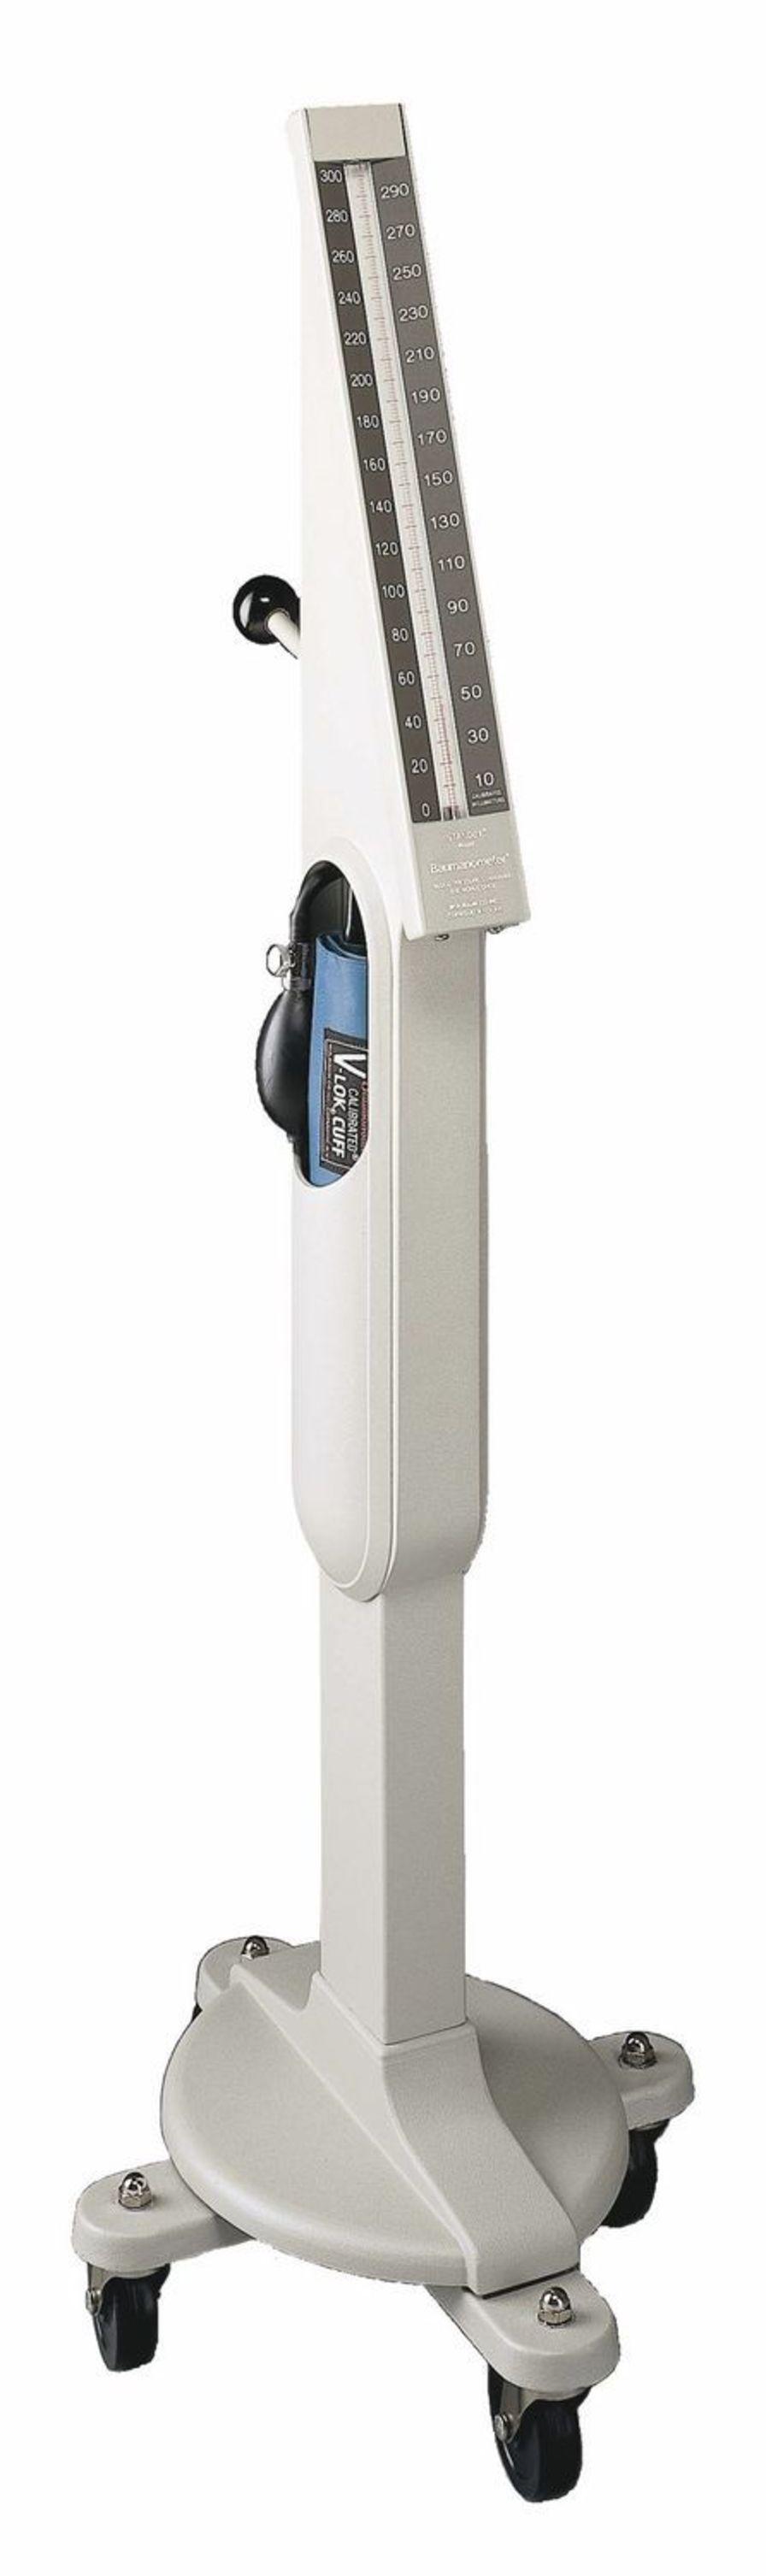 Mercury sphygmomanometer / floor standing Baumanometer® Standby® series W.A. Baum